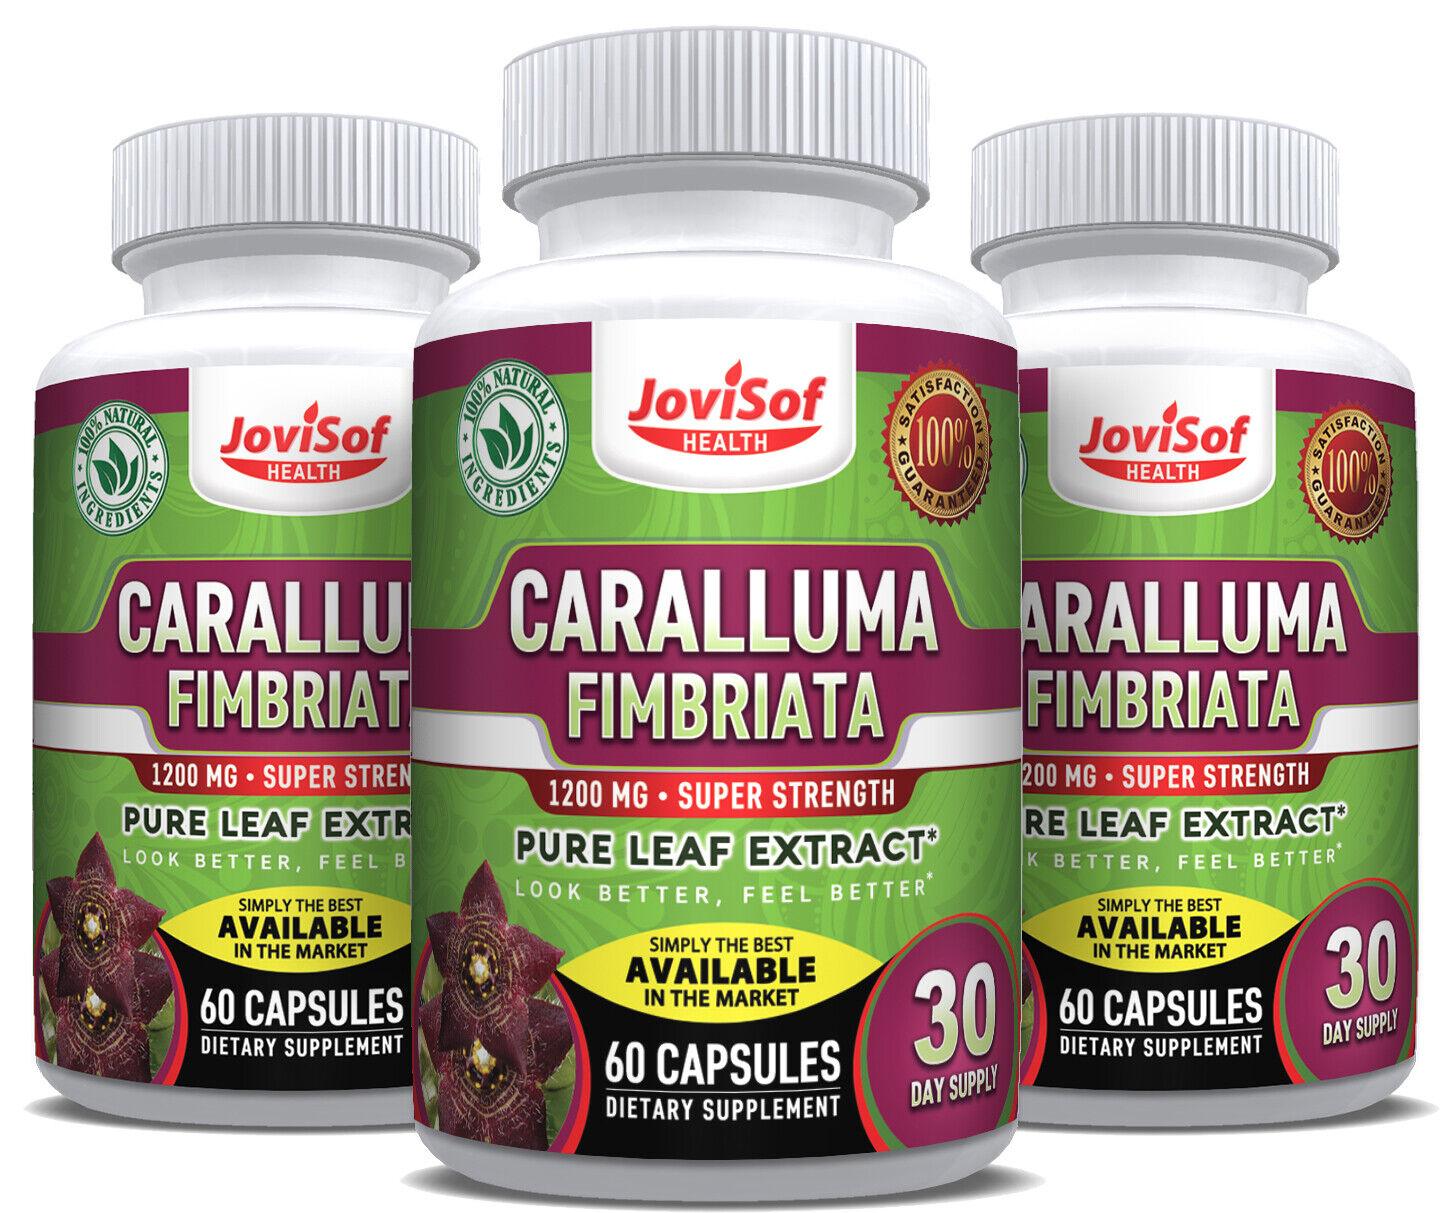 Strongest Caralluma Fimbriata 1200 Mg. Lose Weight Fast! Appetite Suppressant